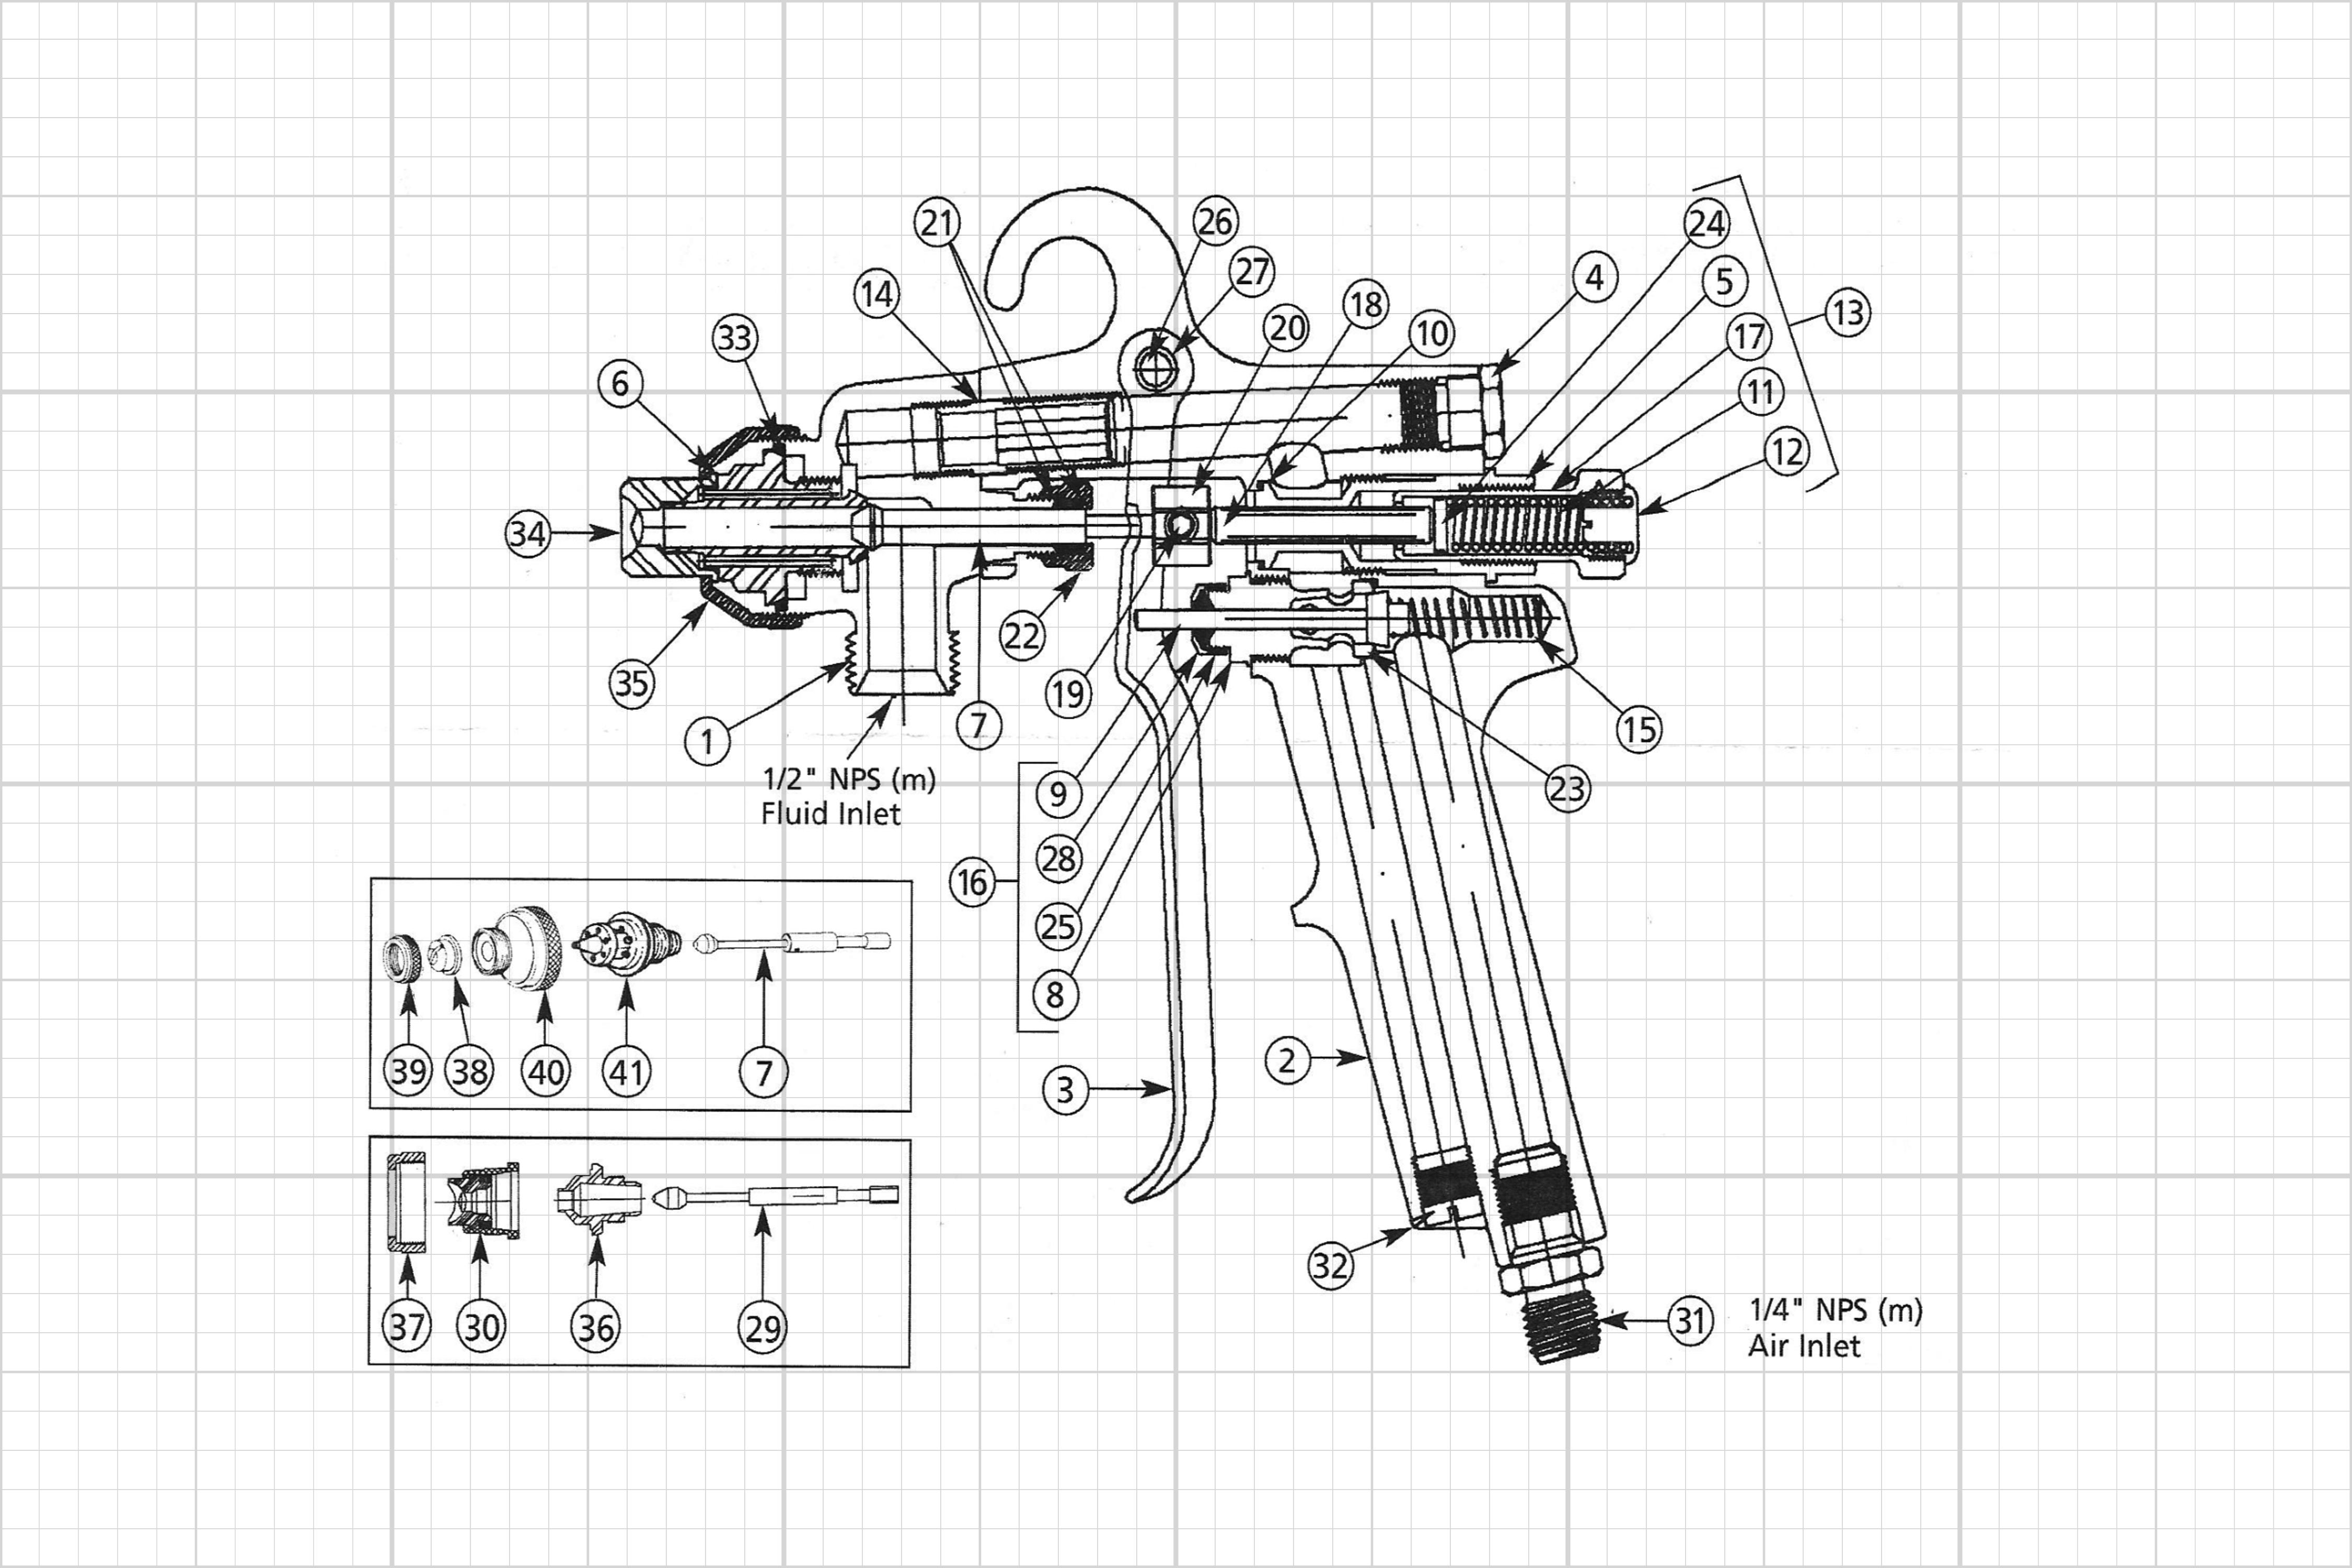 Drawing for Binks Spray Gun